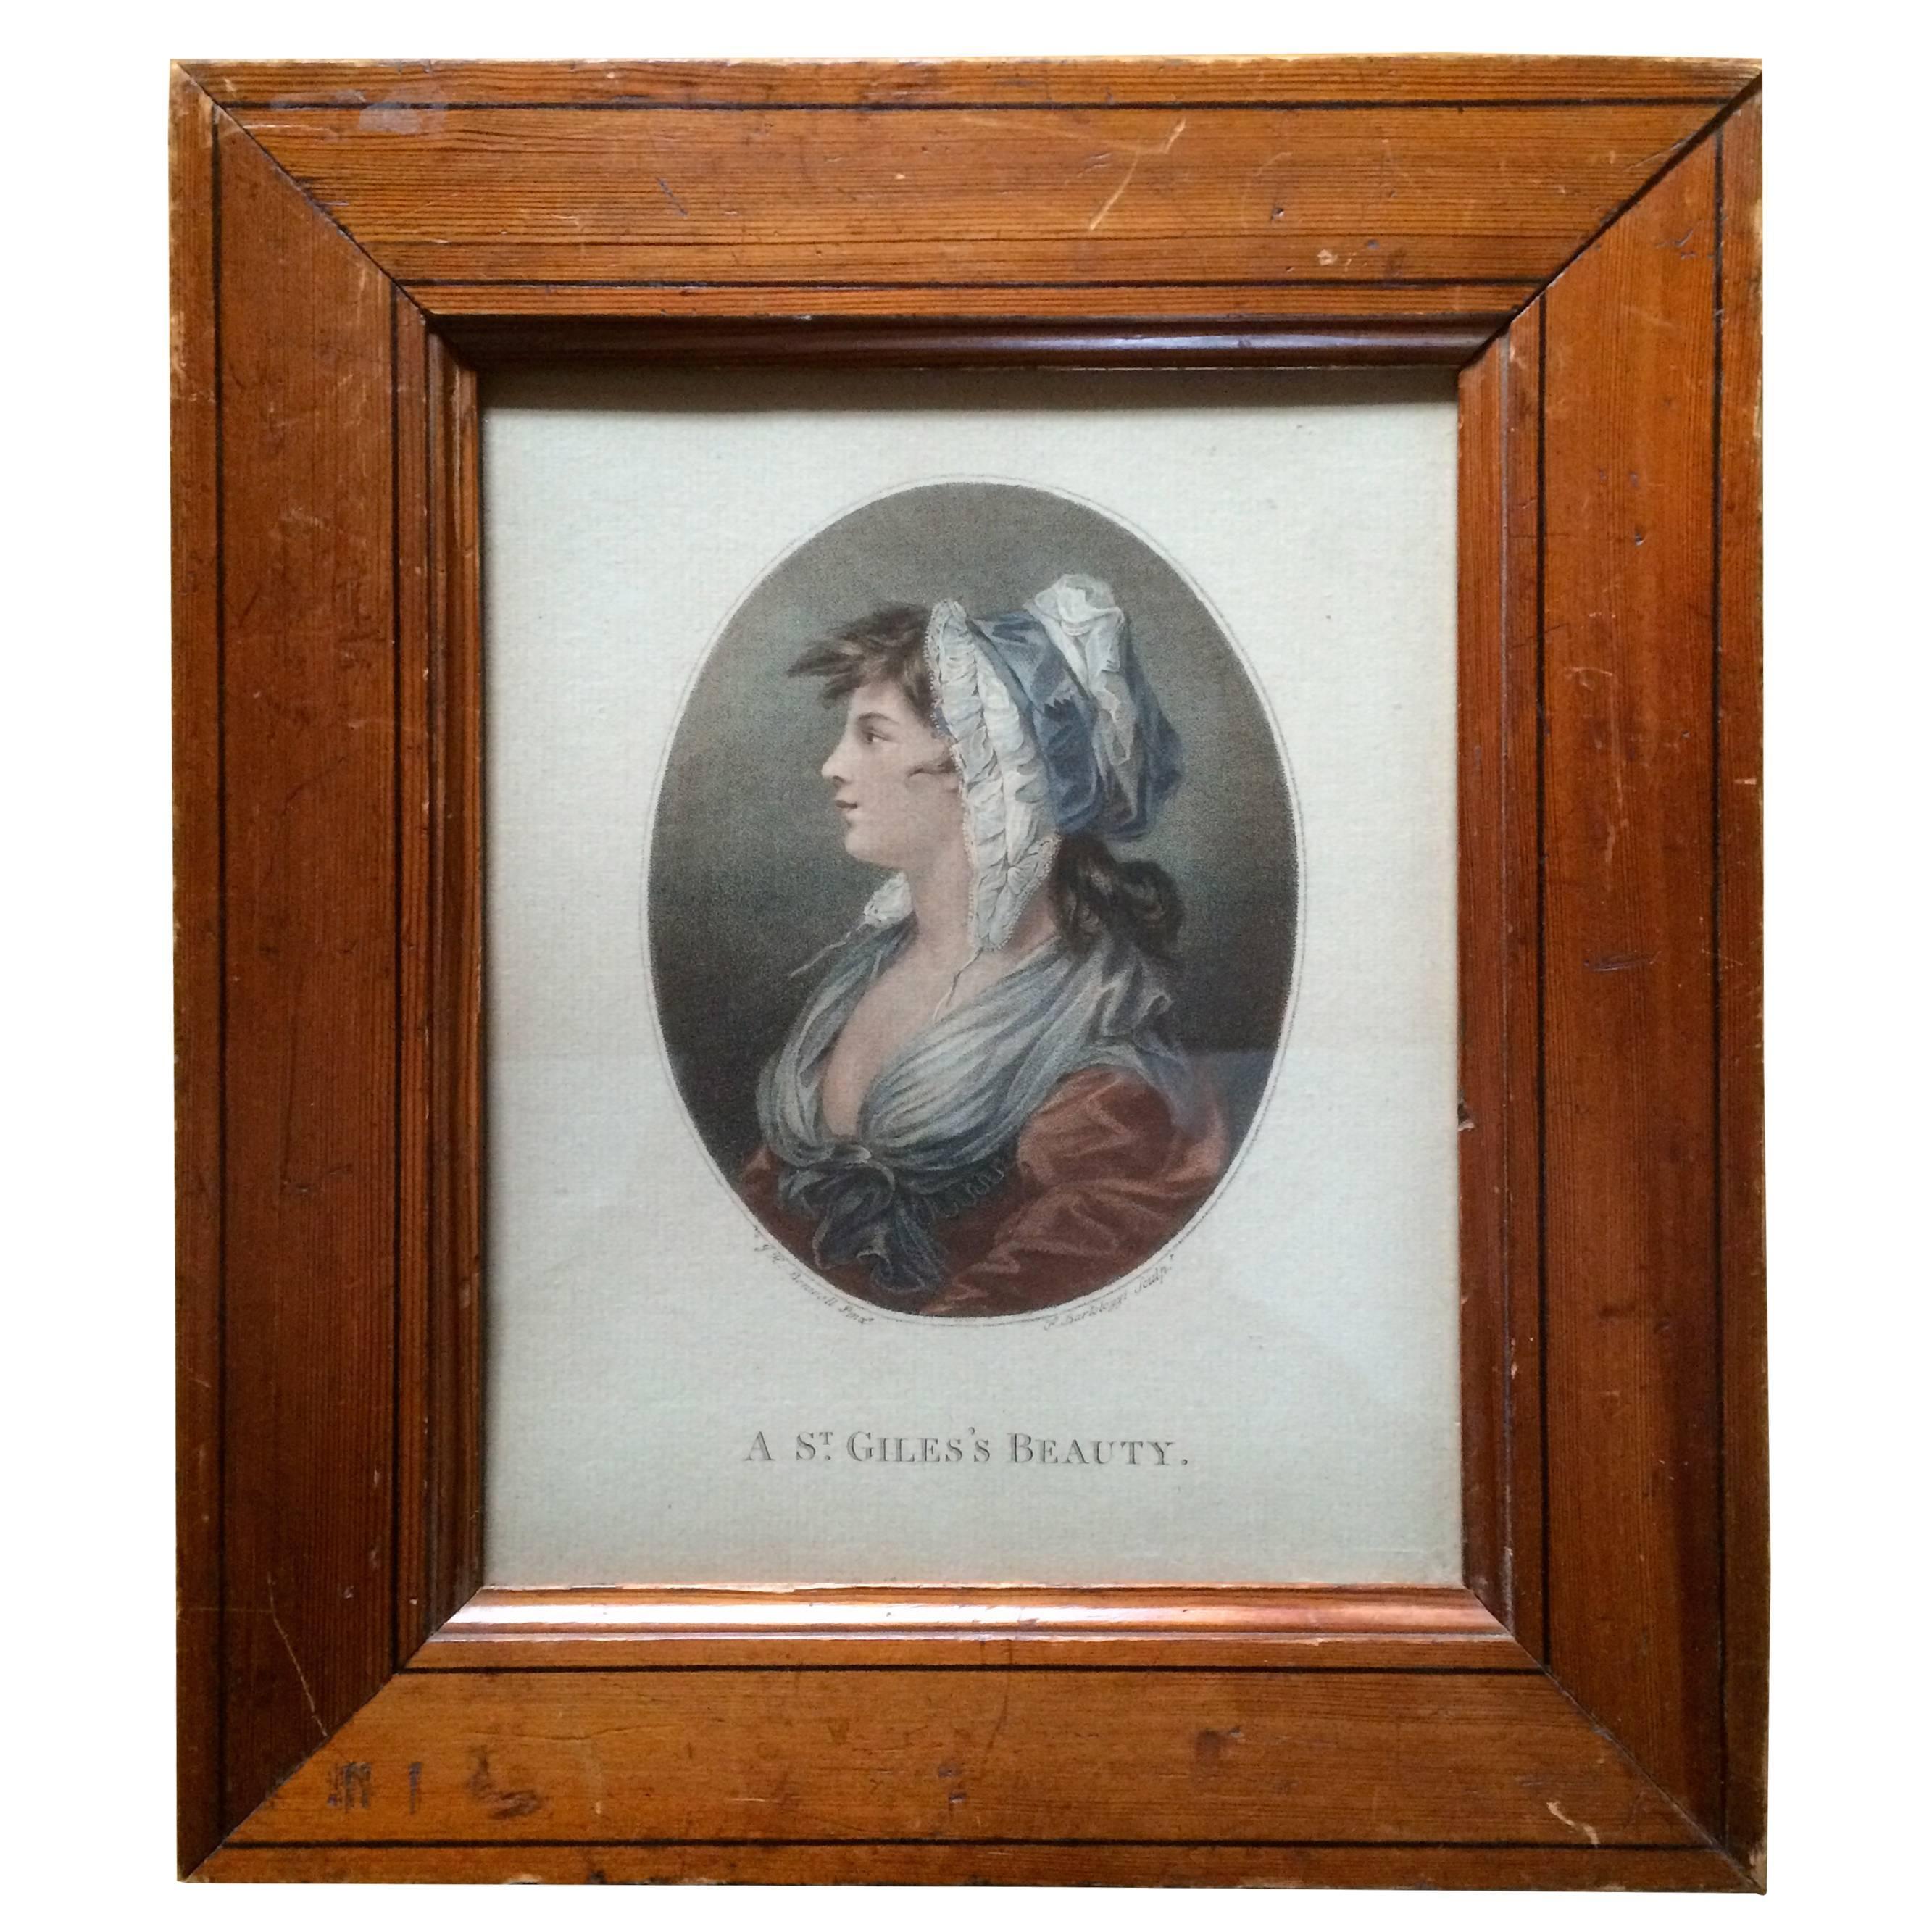 18th Century Color Engraving, A Saint Giles's Beauty